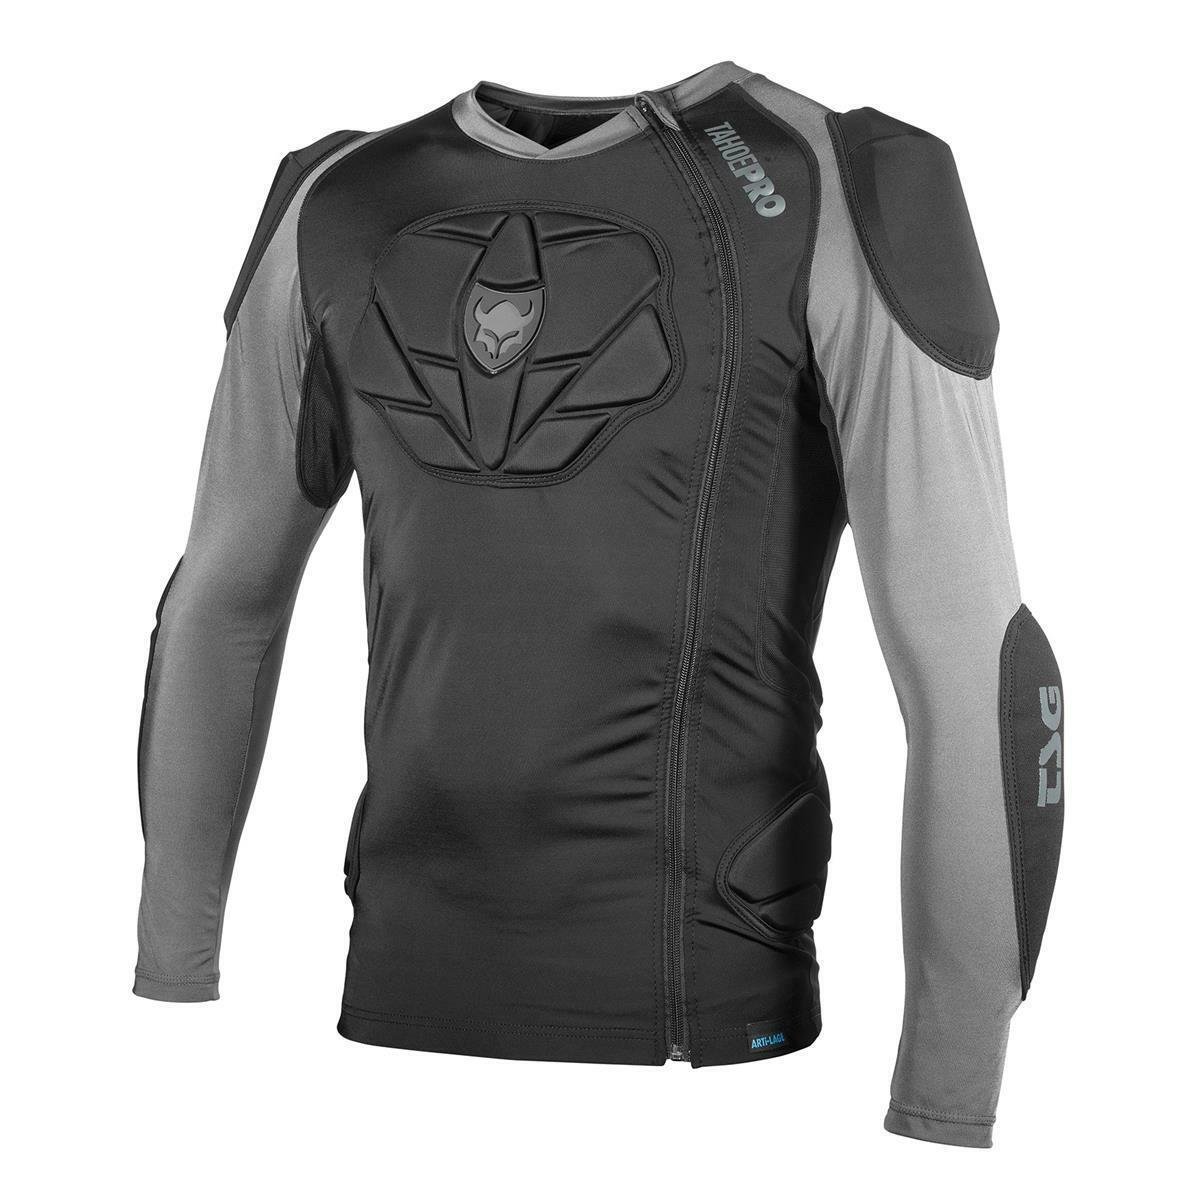 TSG projoective bicicleta DH Projoektor MX camisa L s Tahoe pro a negro XL